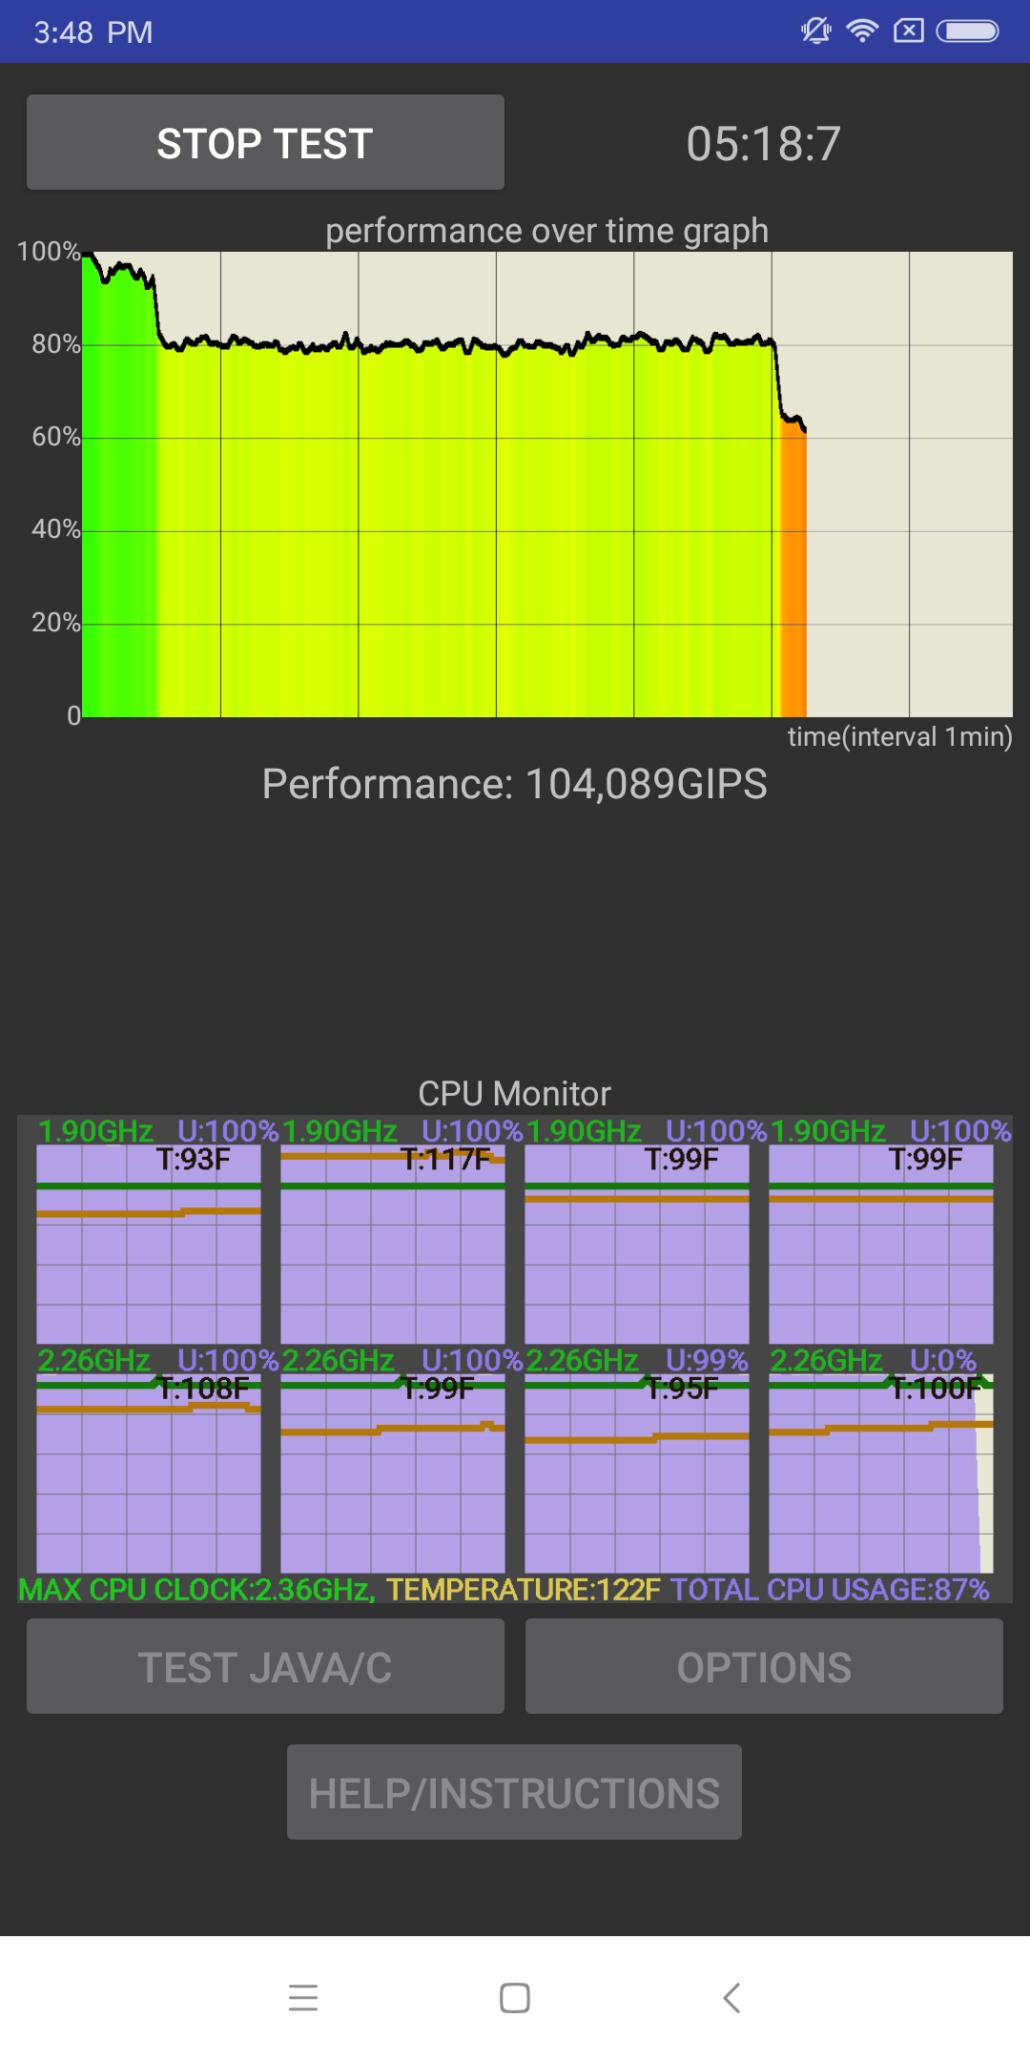 screenshot_2018-01-29-15-48-39-557_skynet-cputhrottlingtest